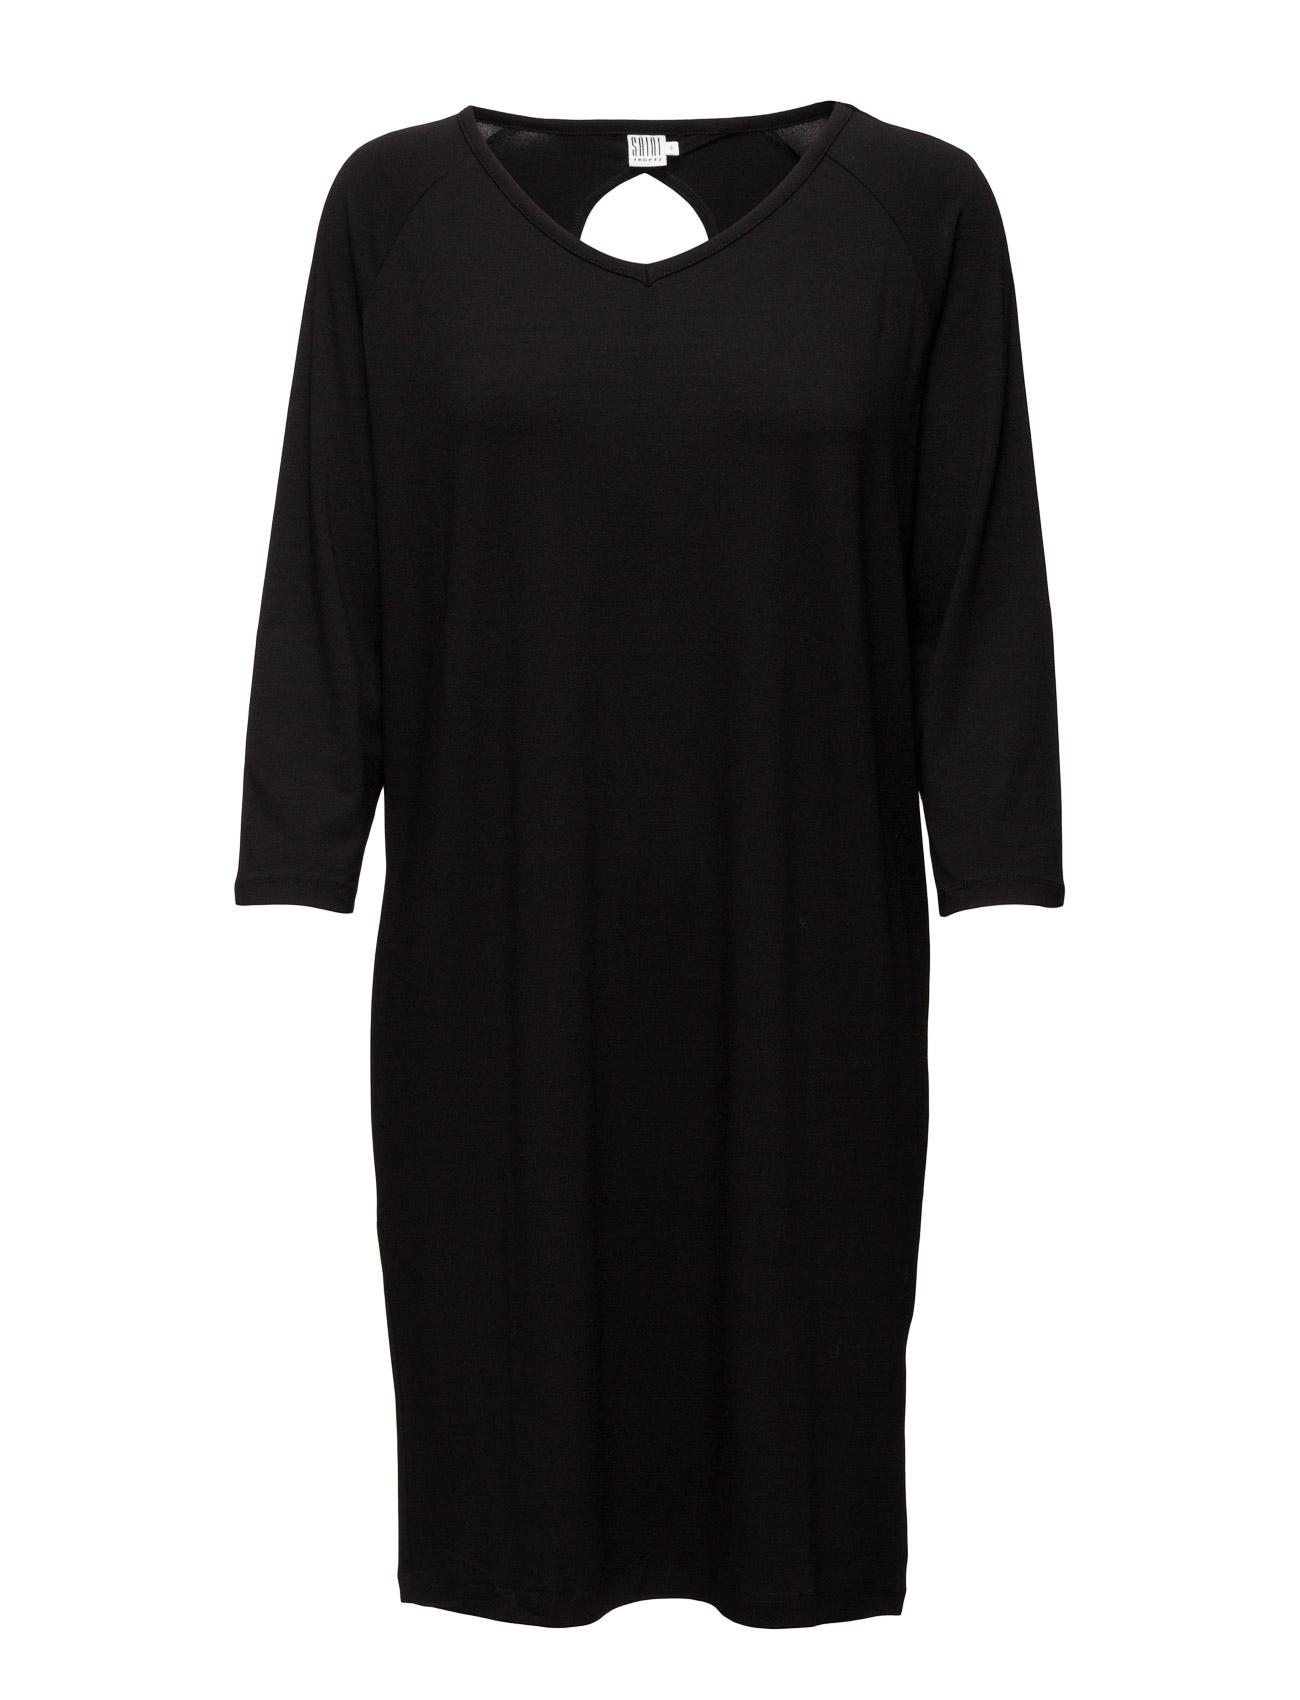 Dress With Neck Hole Detail Saint Tropez Korte kjoler til Damer i Sort